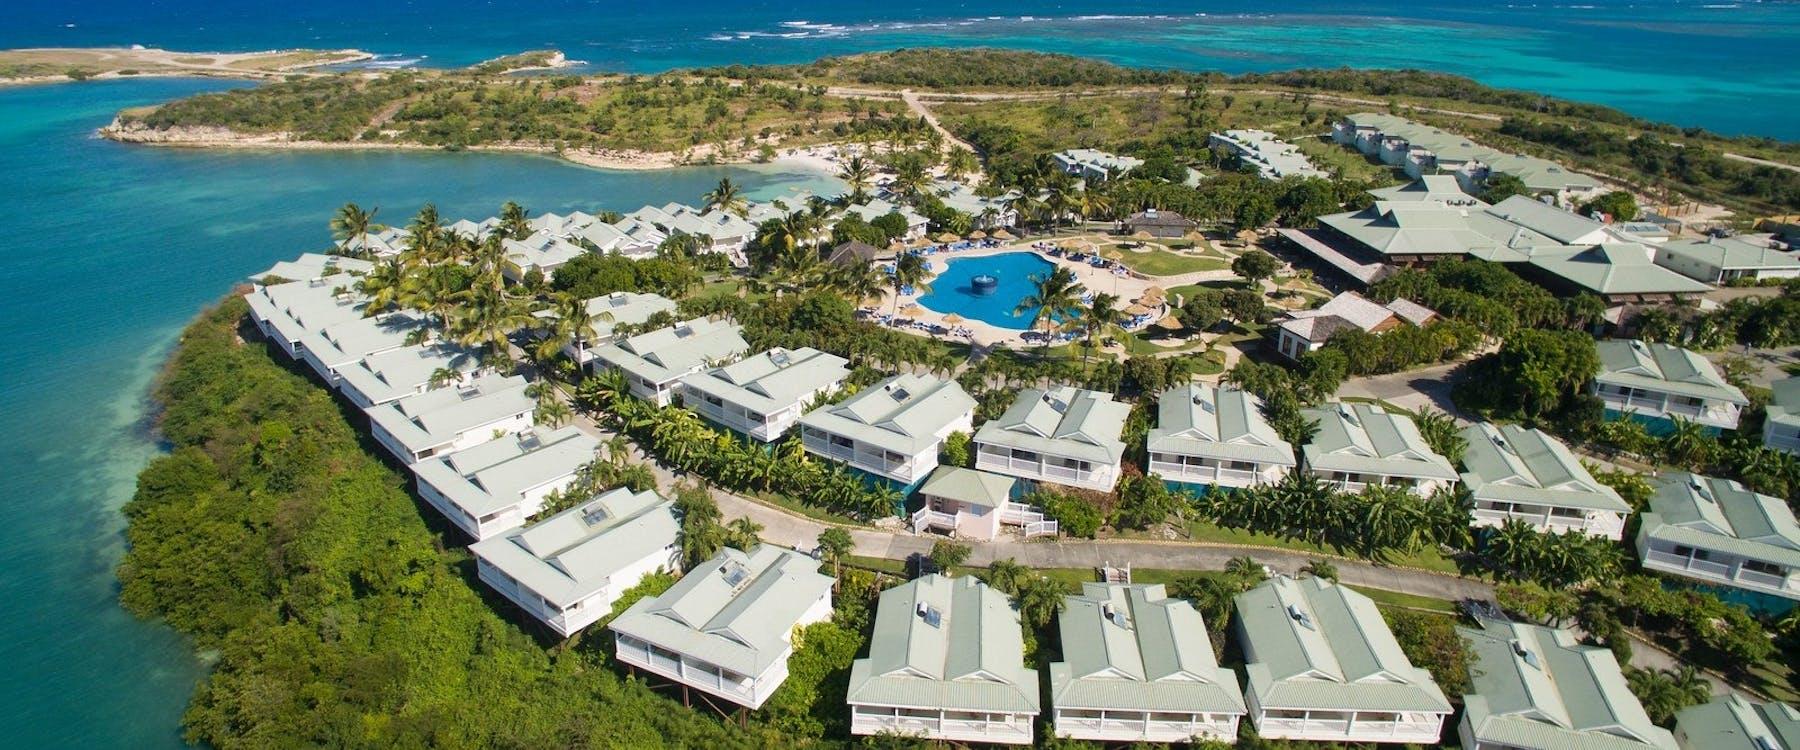 Verandah Resort Holidays - Eco Antigua Hotels